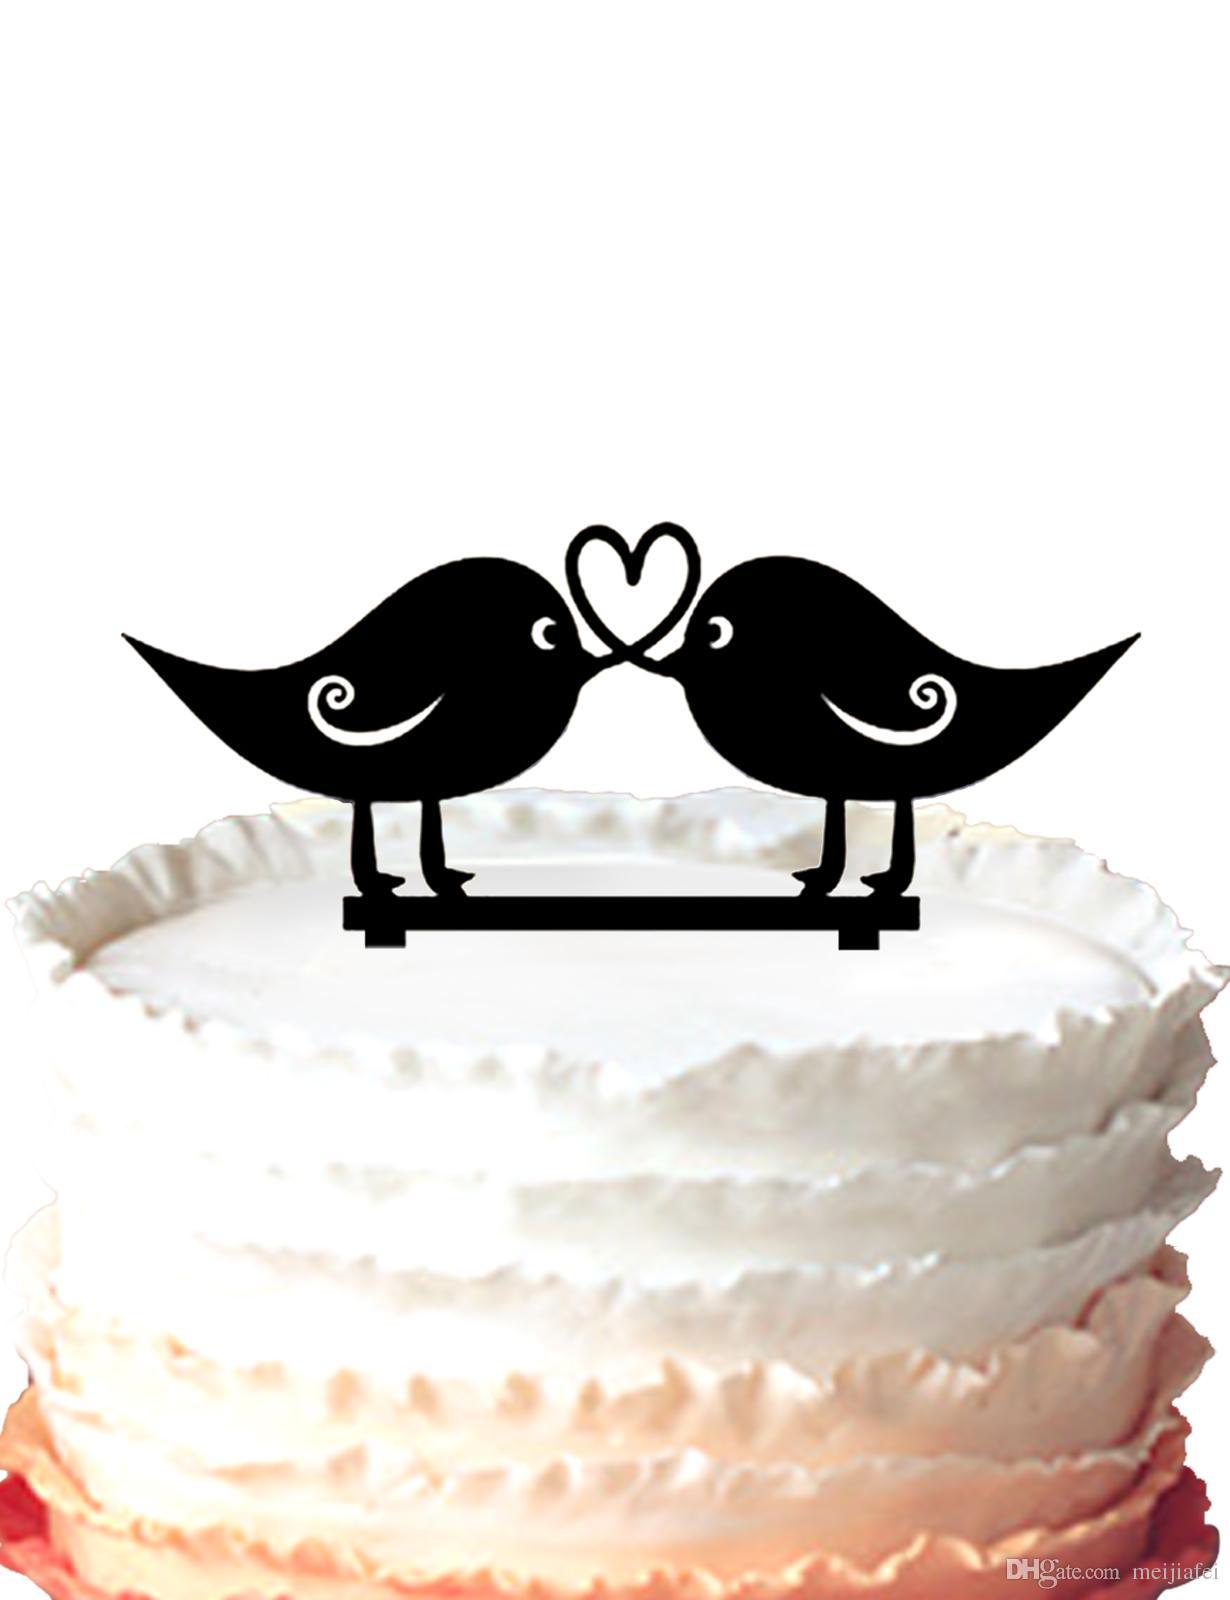 2019 Wedding Cake Topper Two Cute Love Birds Acrylic Cake Topper Heart Design For Option From Meijiafei 18 21 Dhgate Com